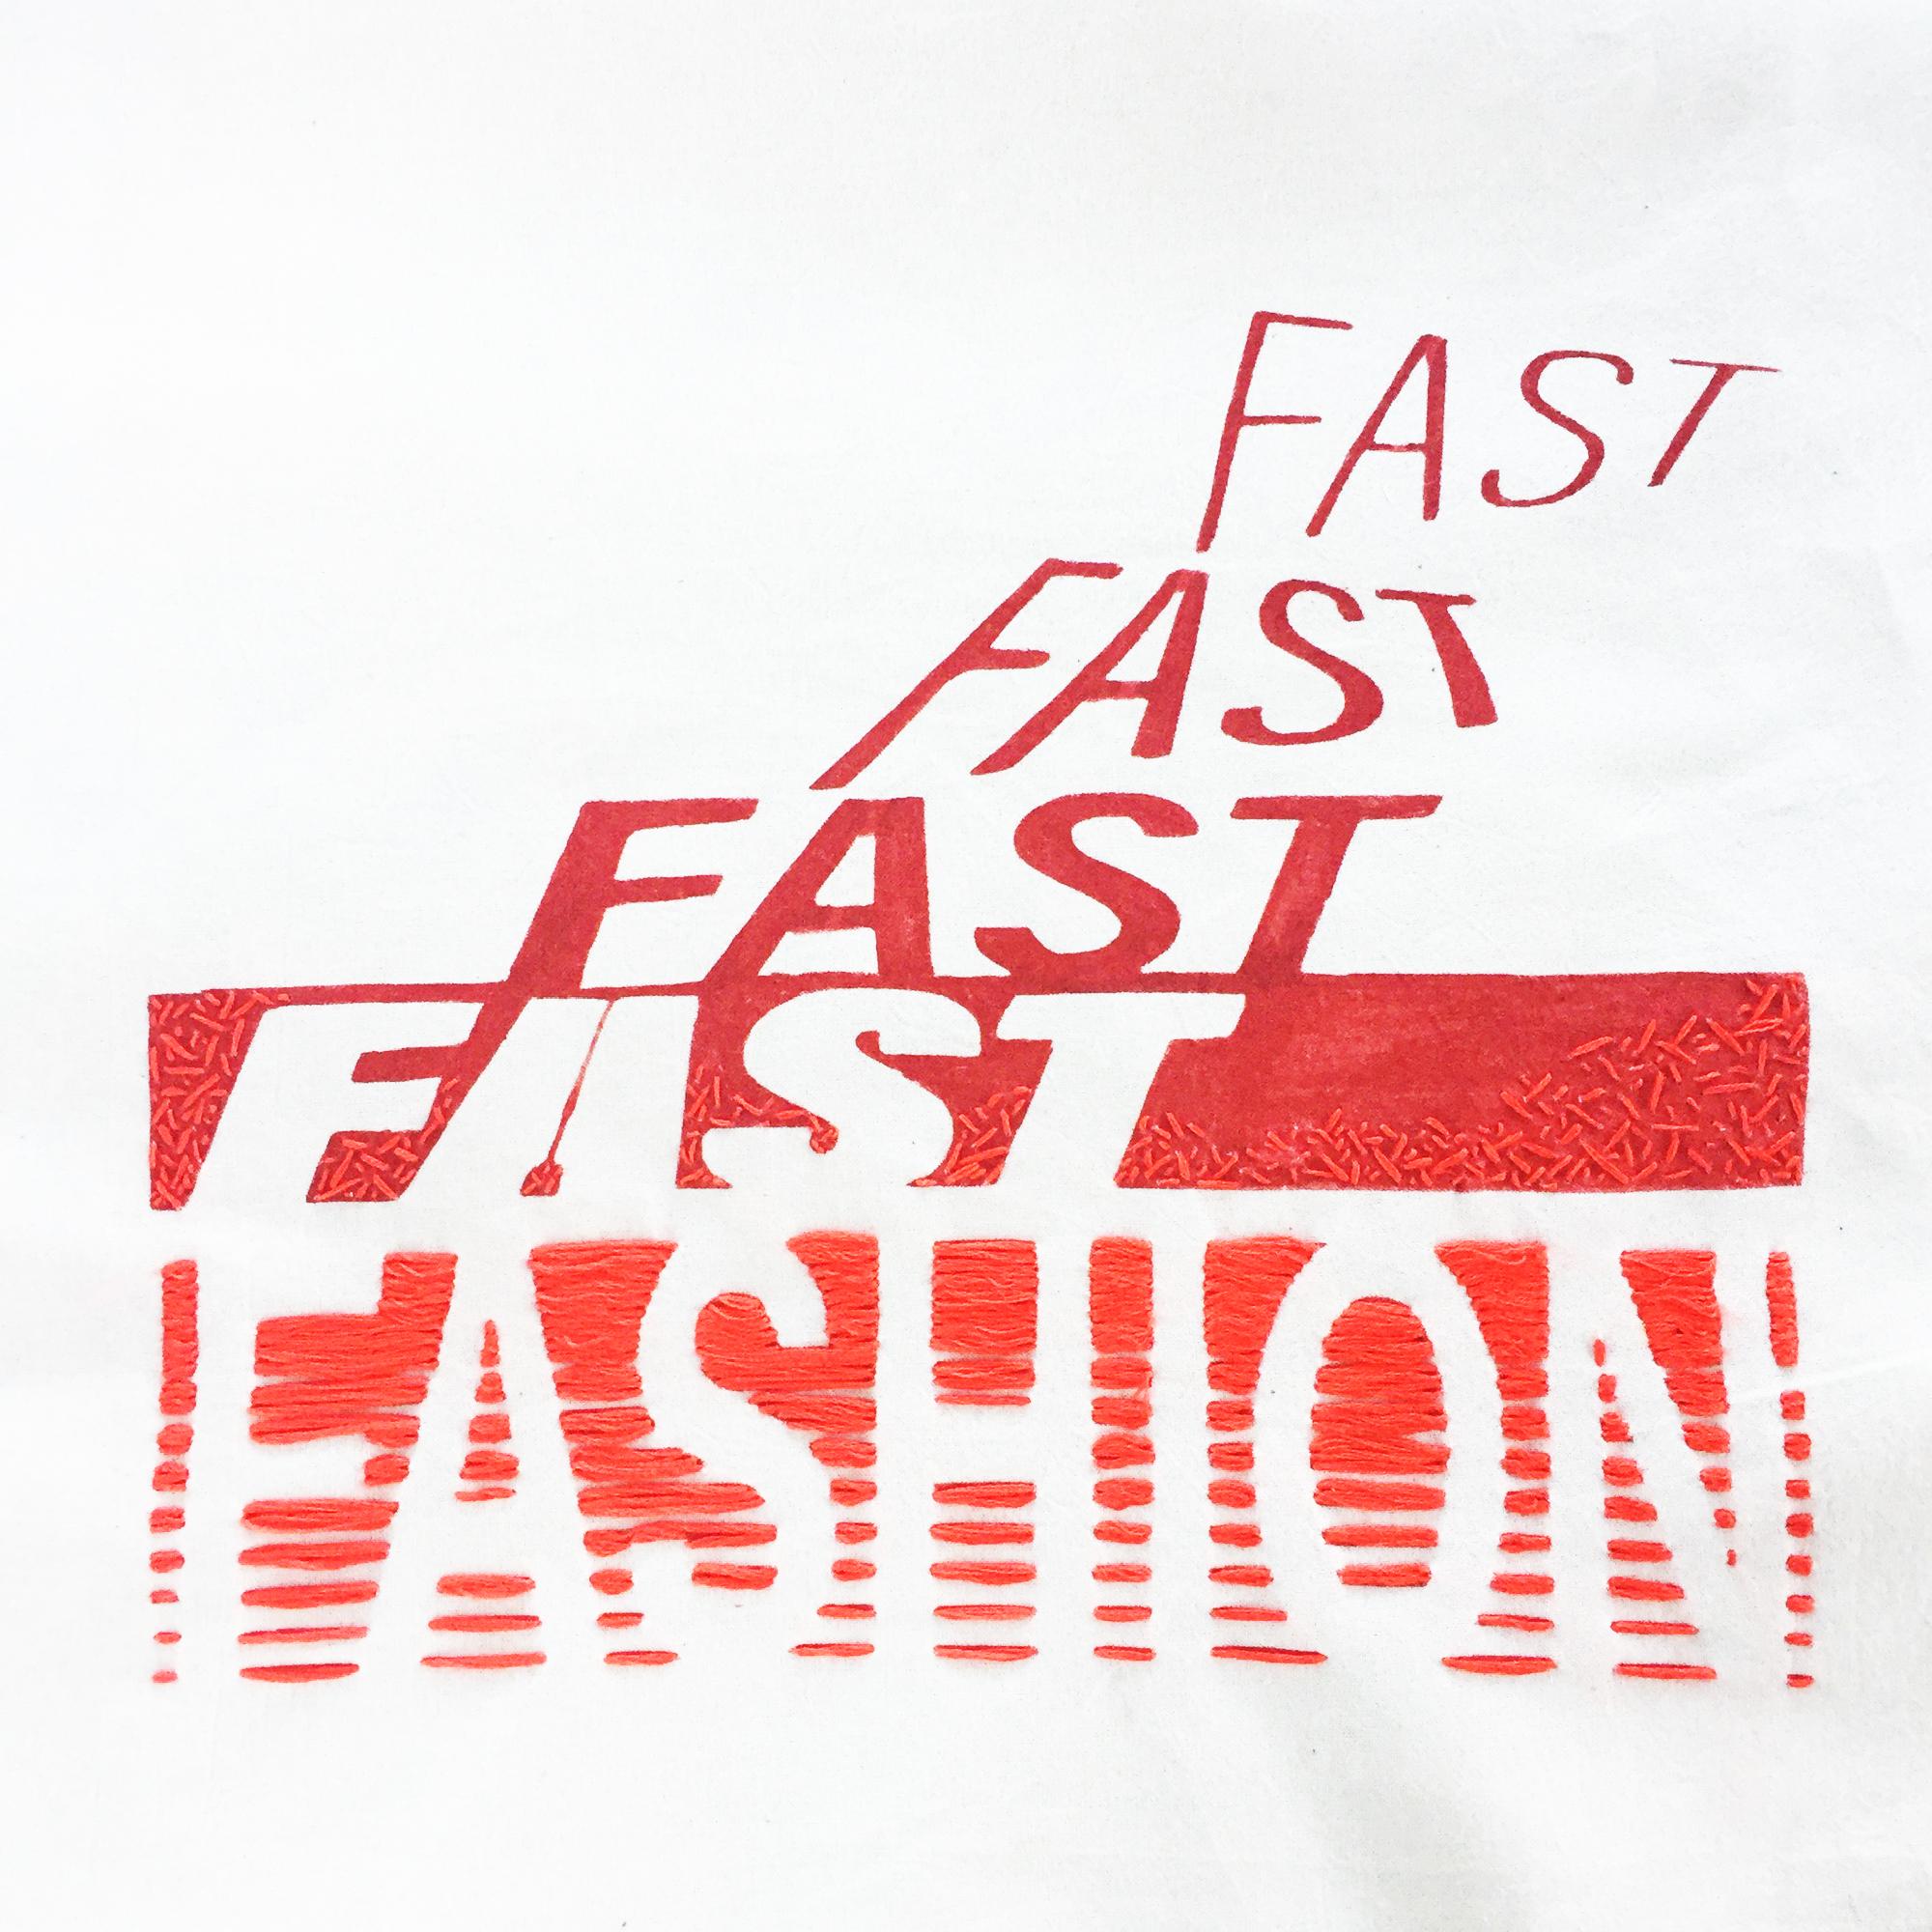 What-is-fast-fashion.jpg